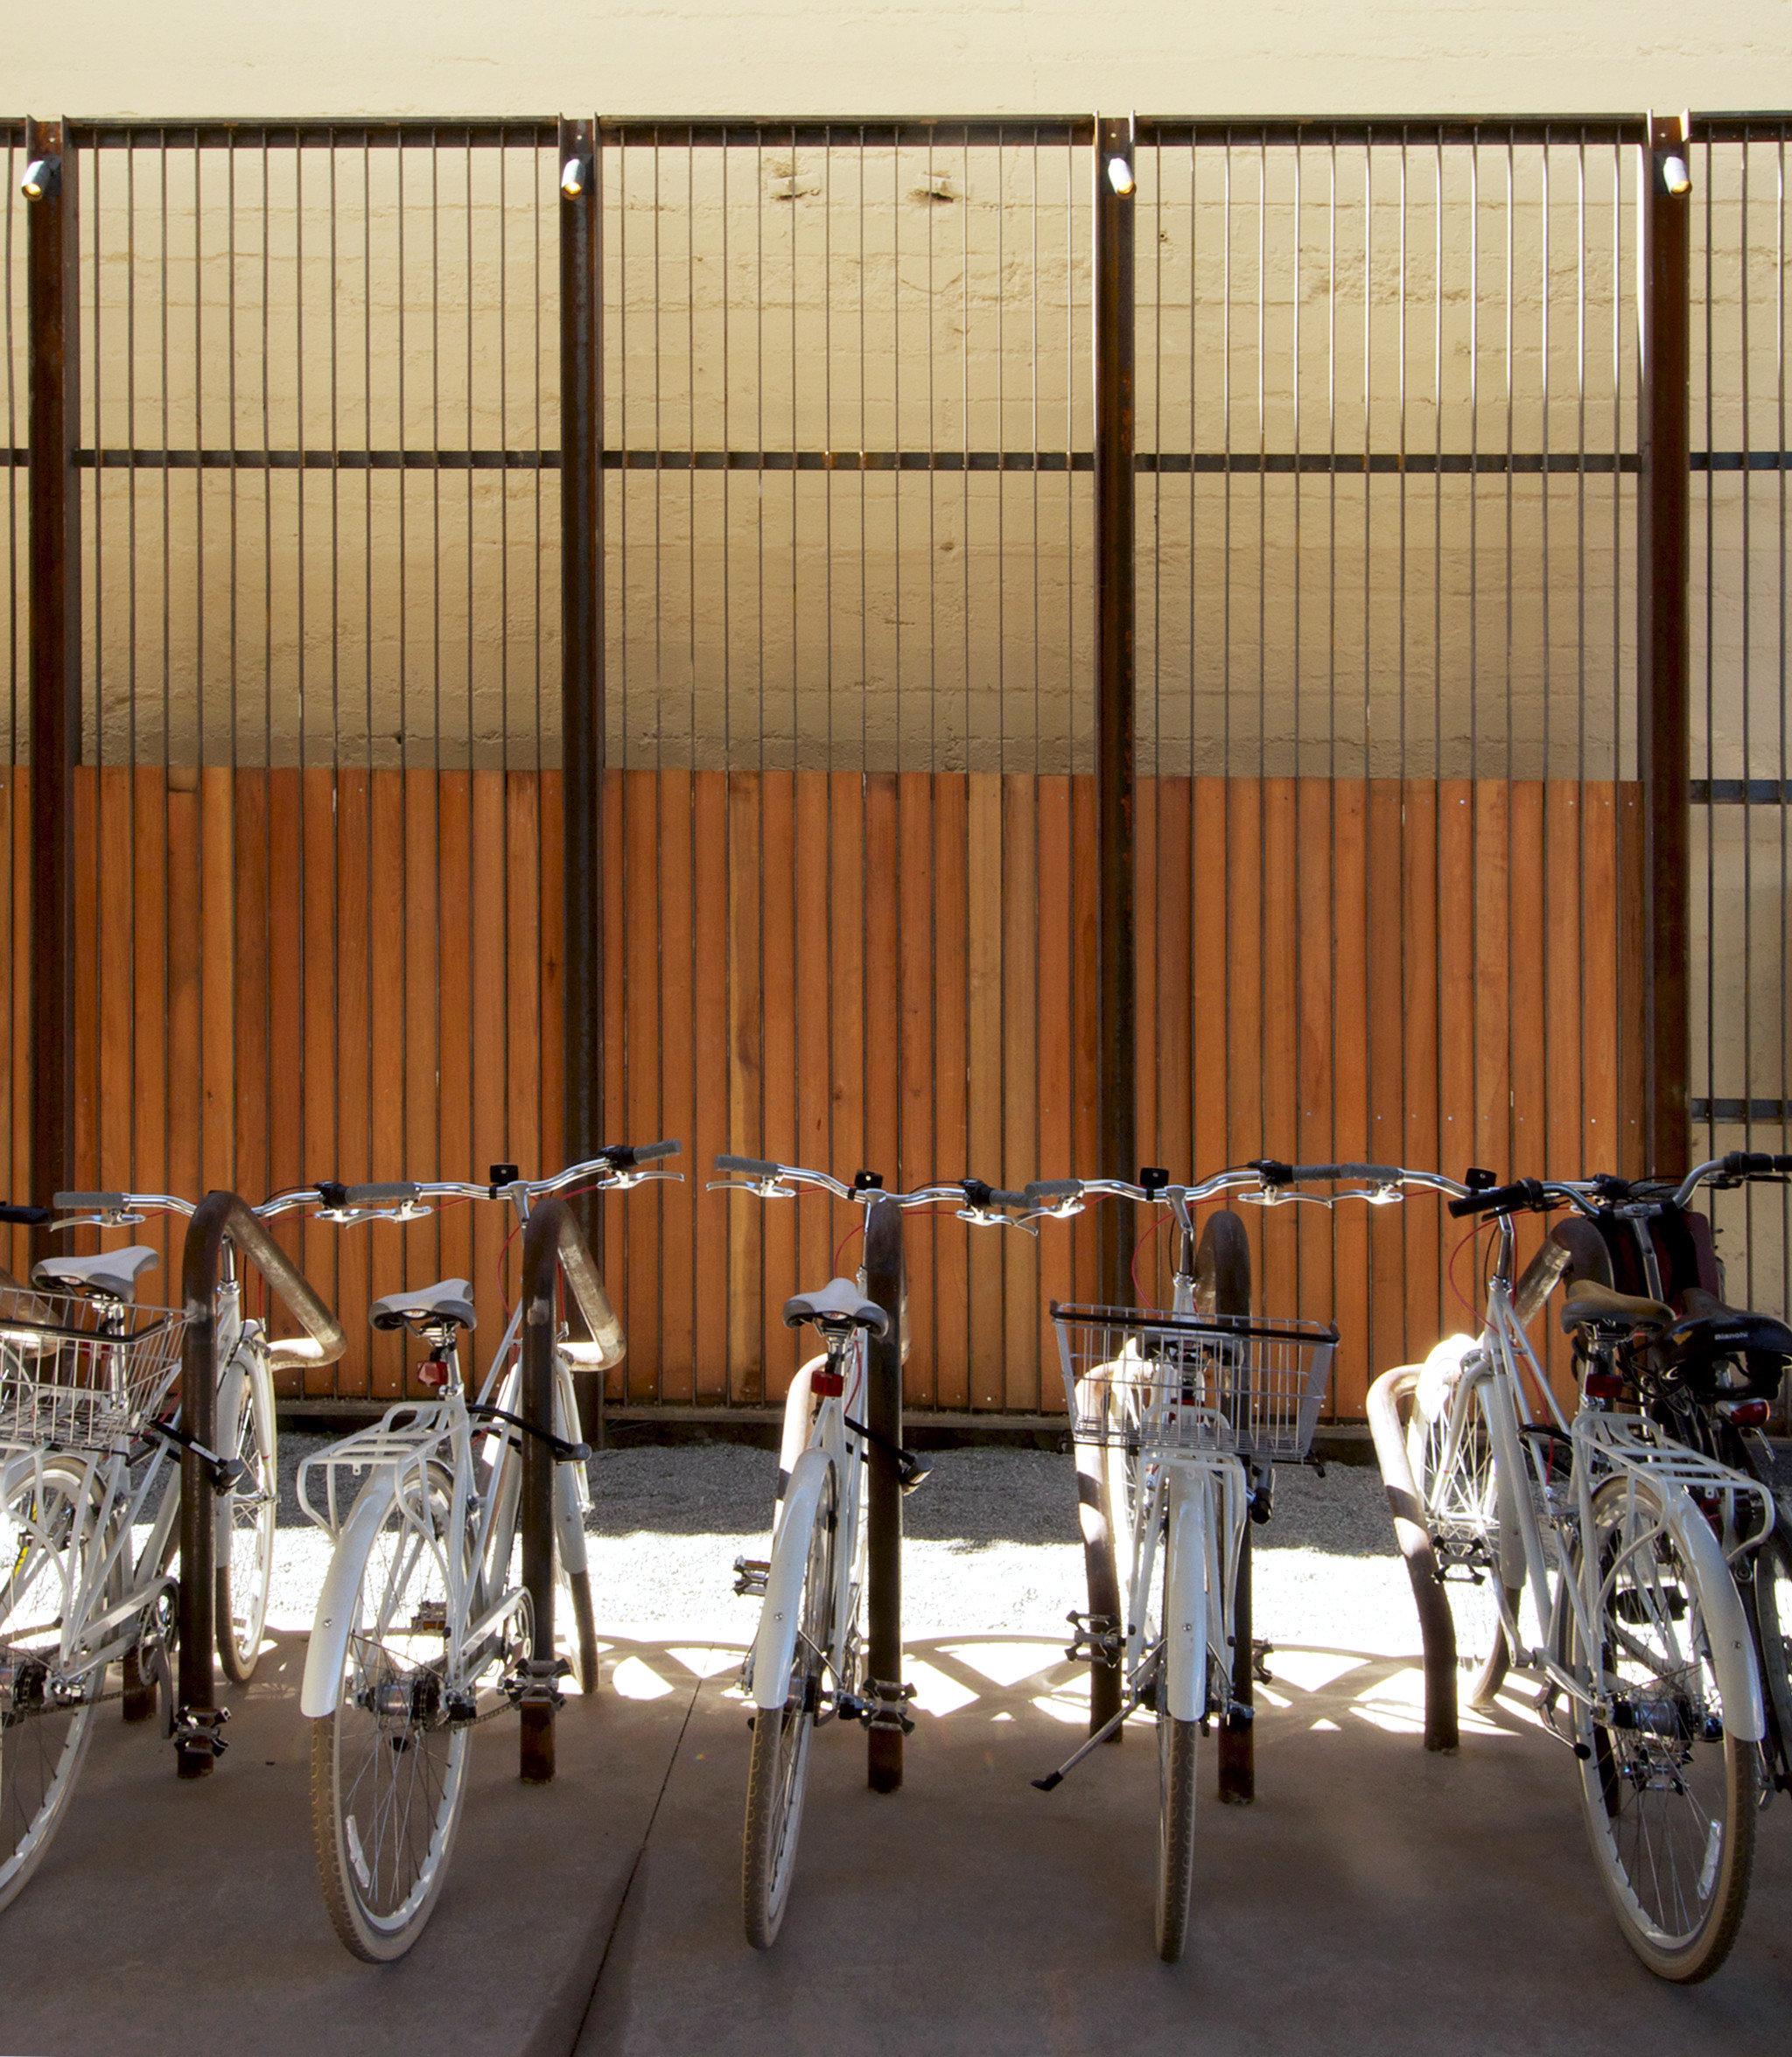 Fitness Health + Wellness Hip Hotels Modern Sport Wellness Yoga Retreats bicycle vehicle cart pulling